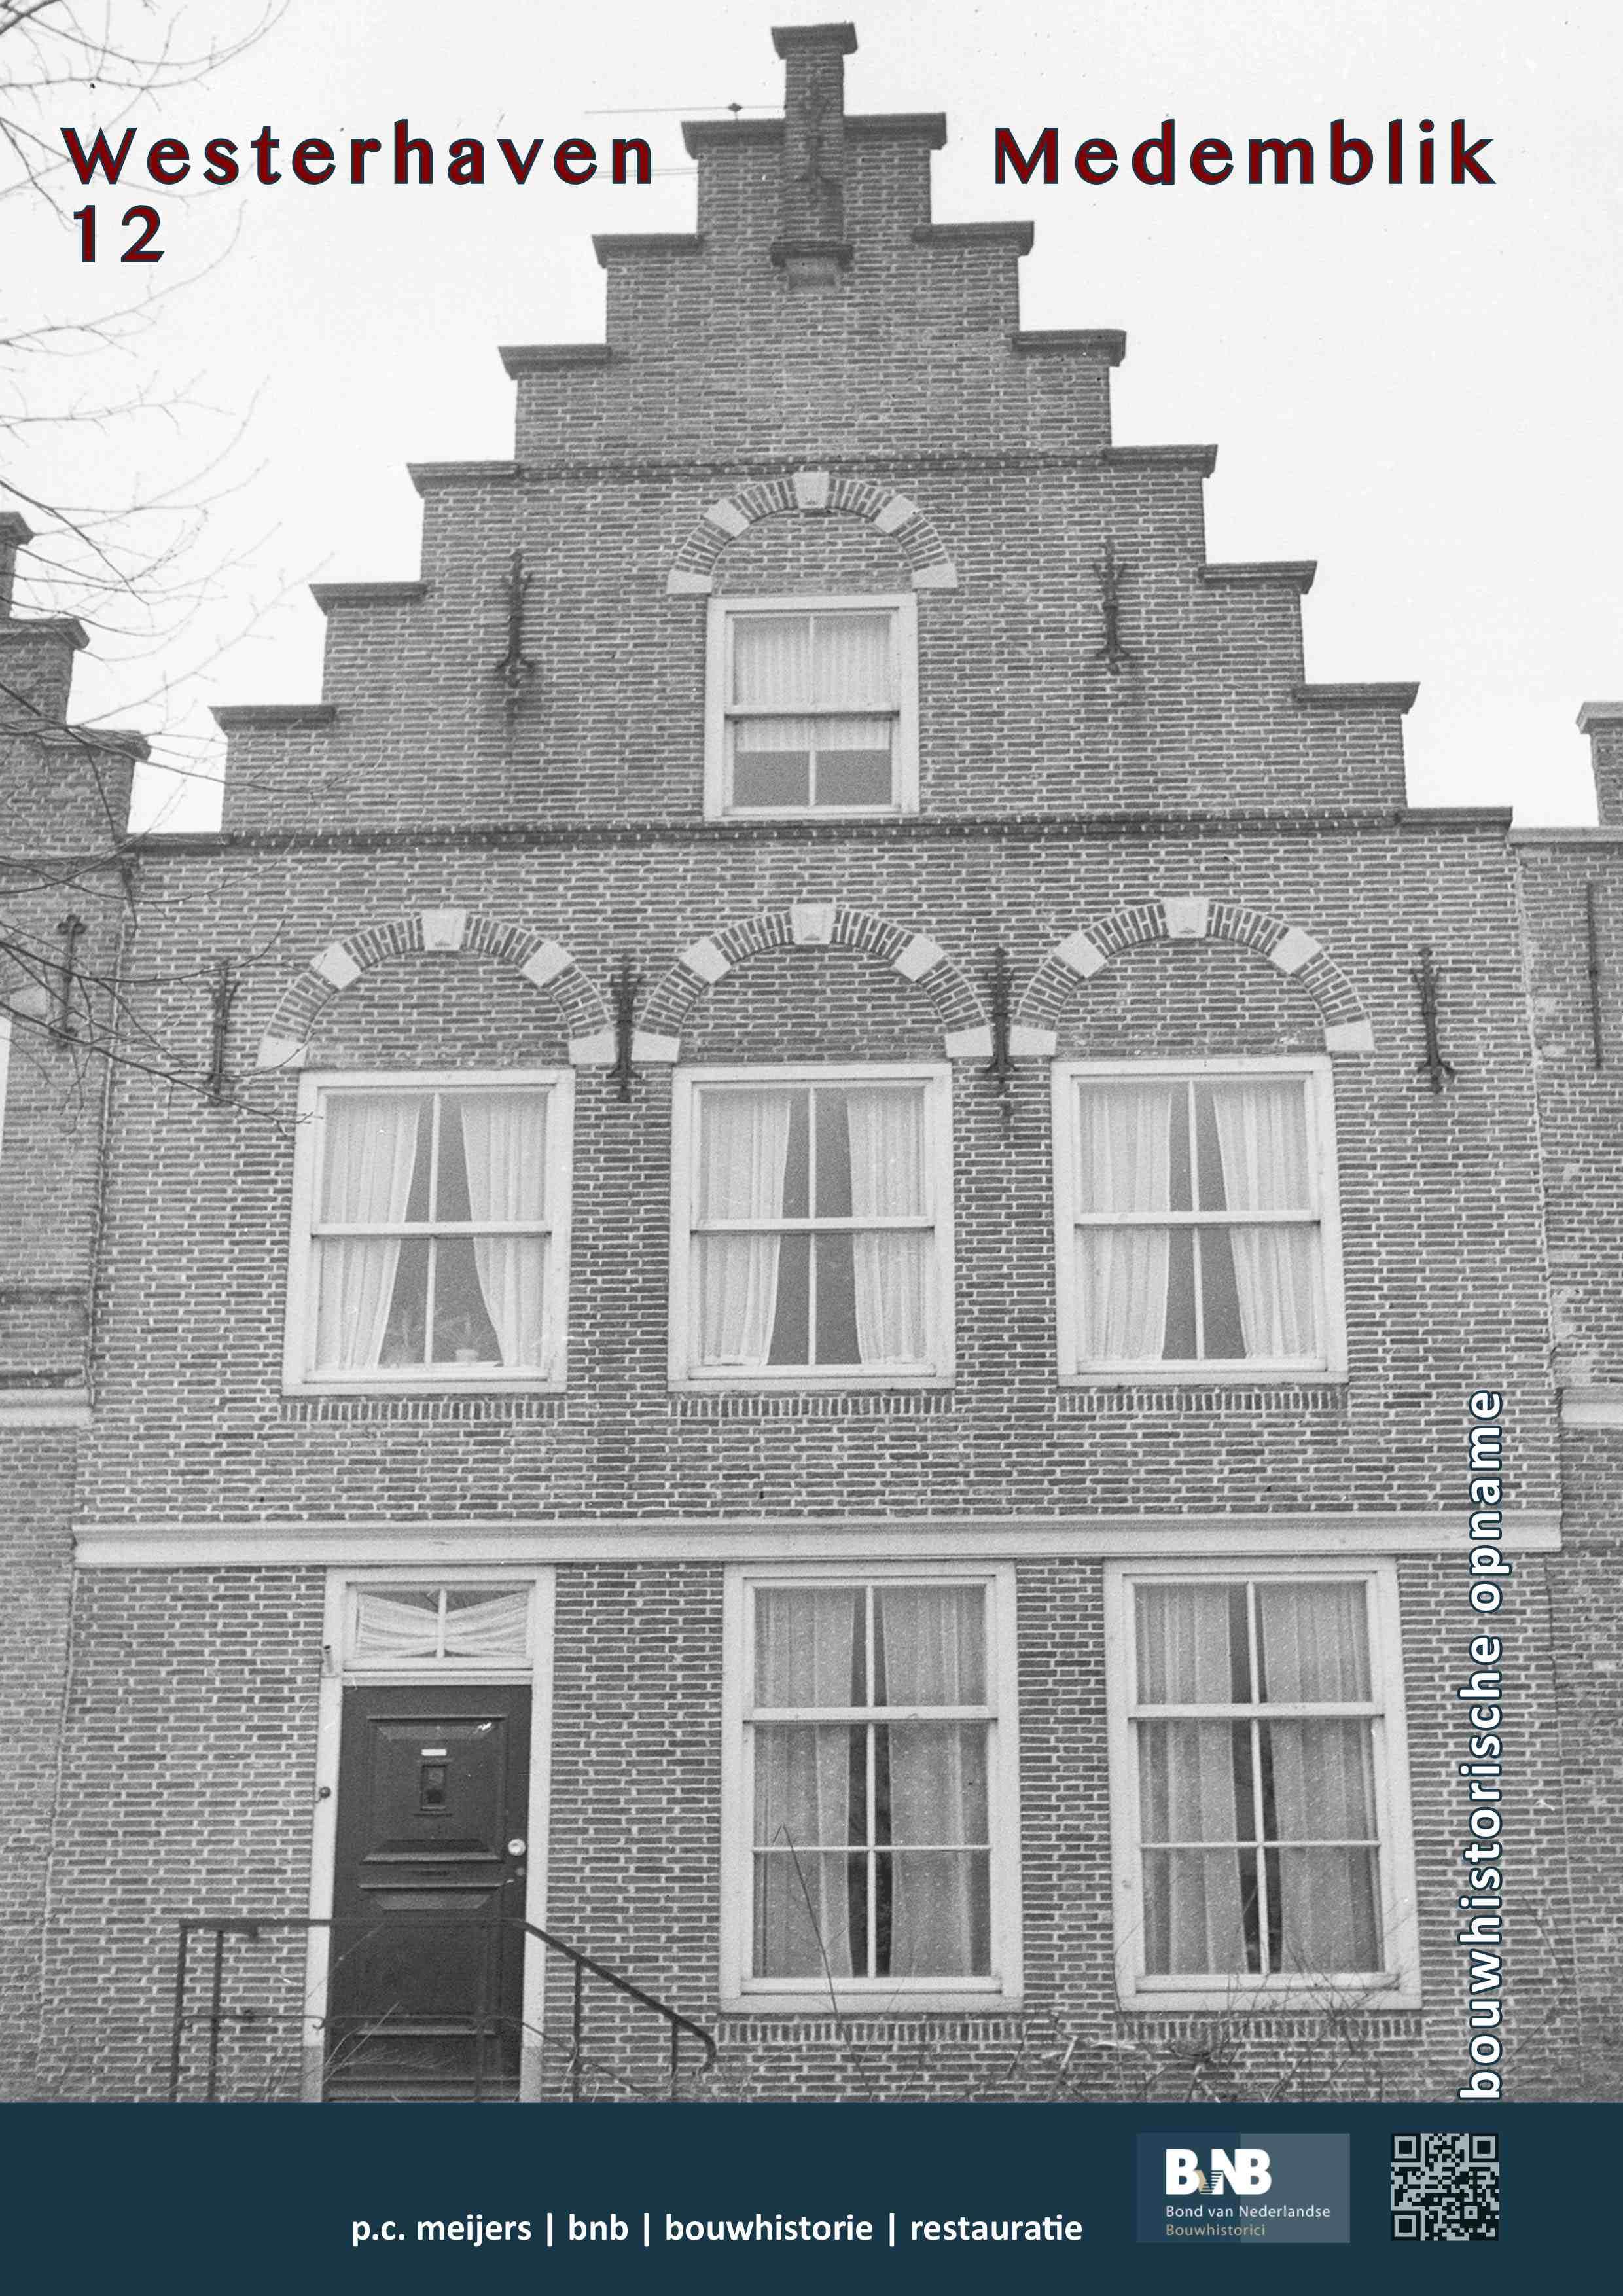 Westerhaven 12, Medemblik